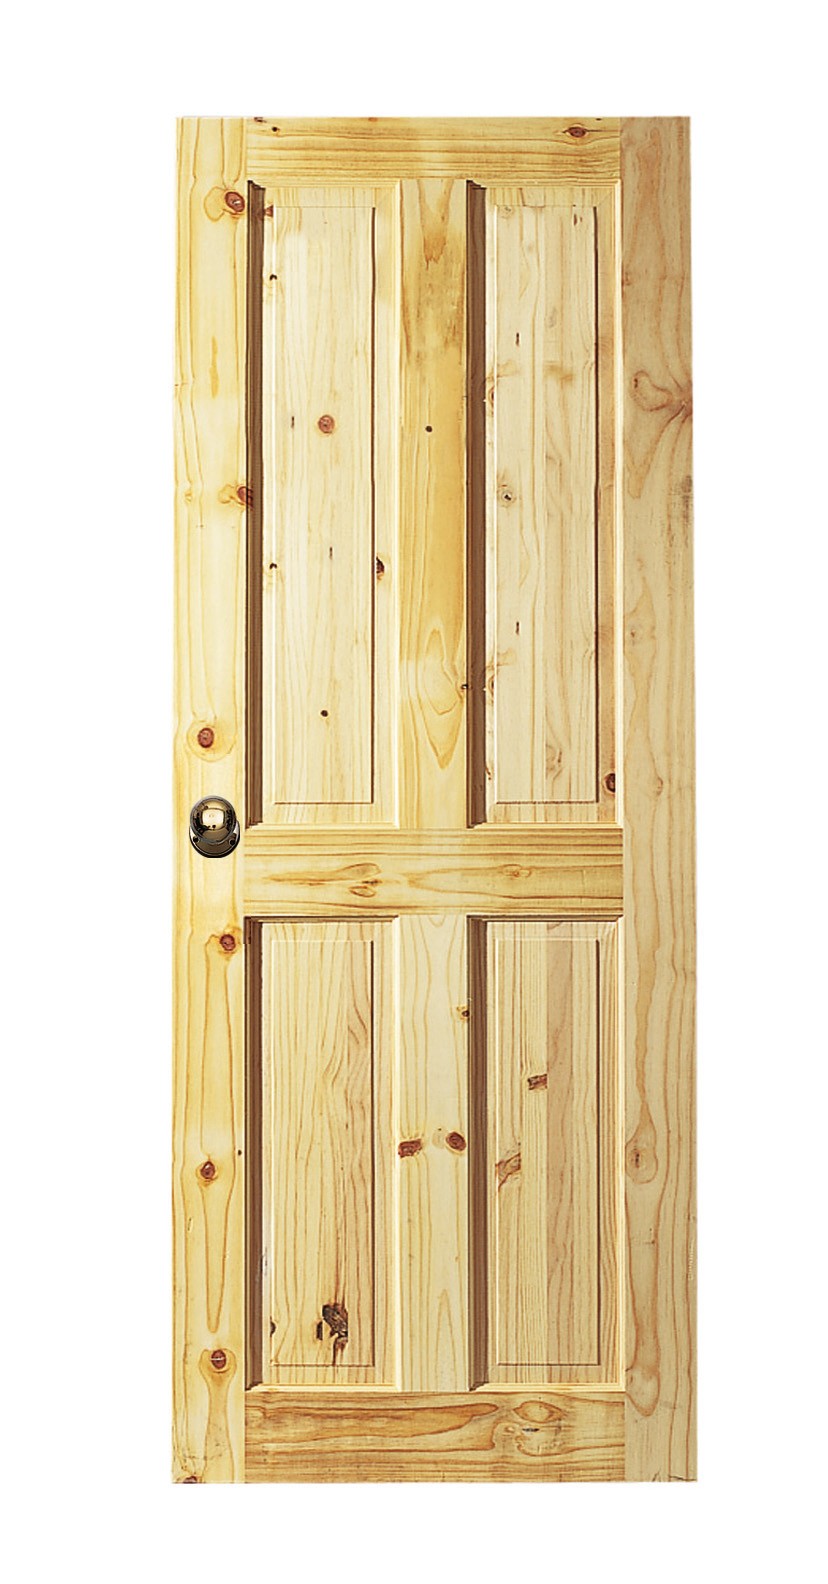 4%20Panel%20Knotty%20Pine Six Panel Pine Interior Doors